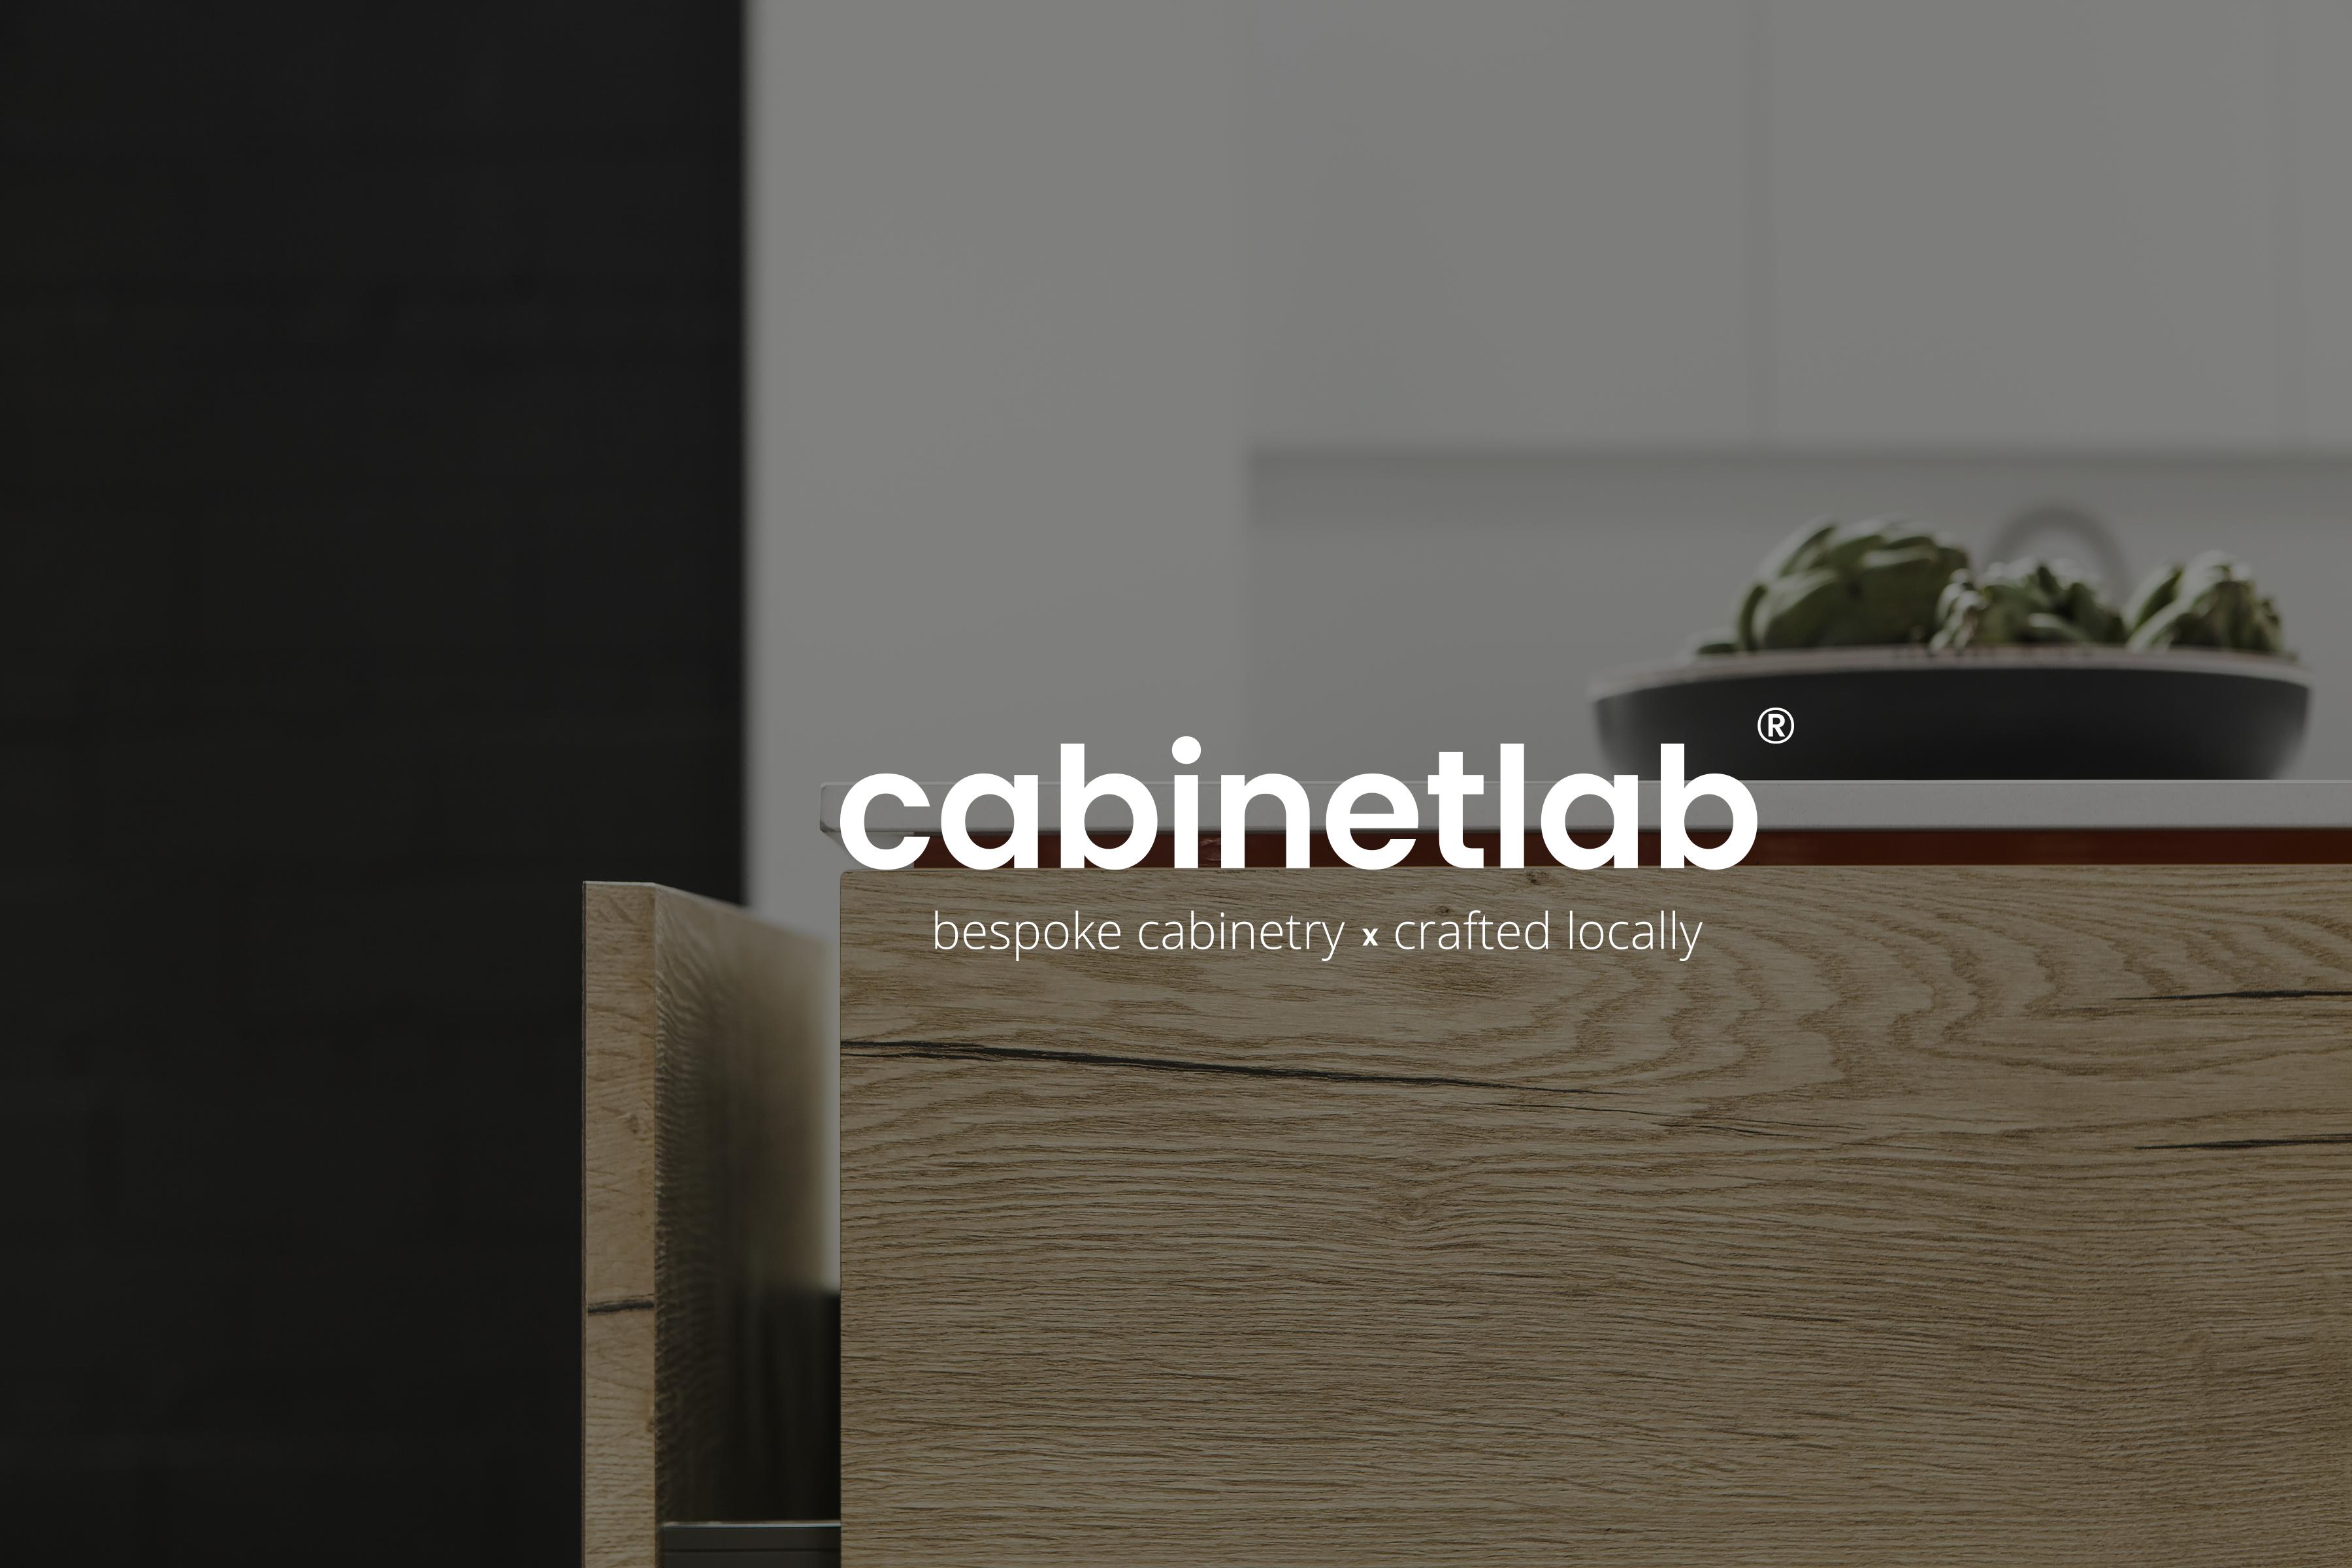 Cabinetlab2670_20200914